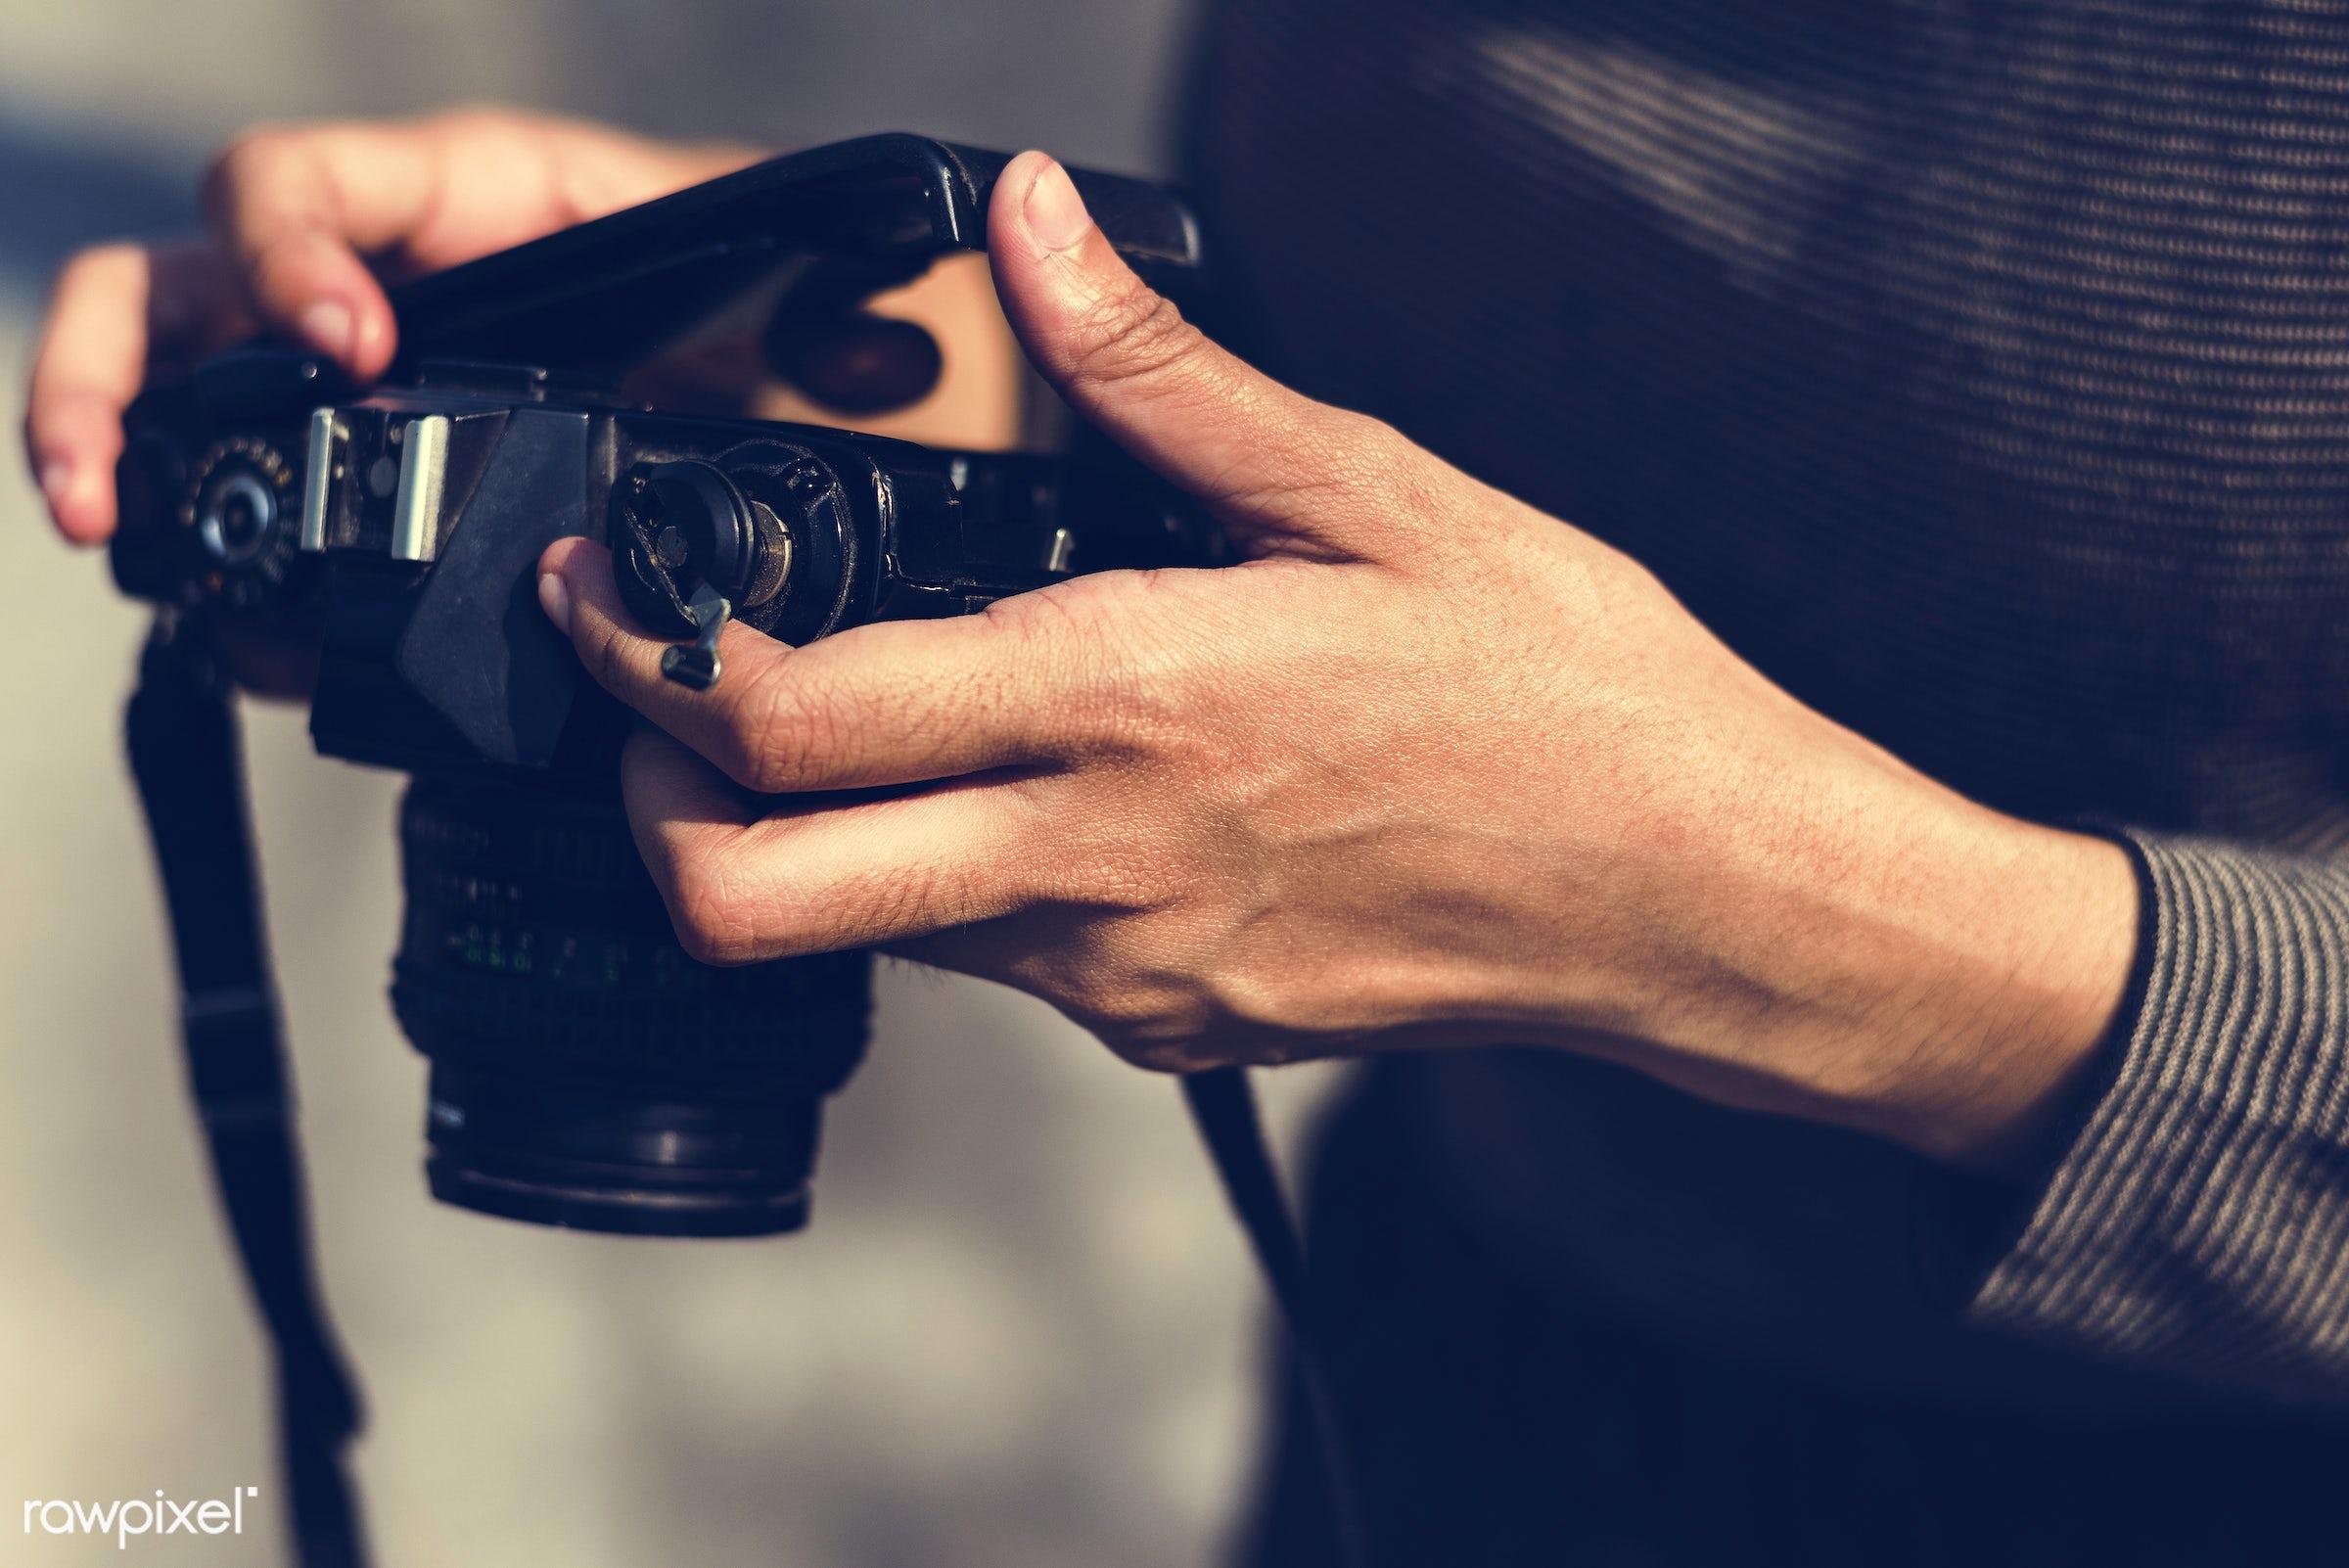 camera, photography, photographer, hands, closeup, film, checking, opening, hobby, equipment